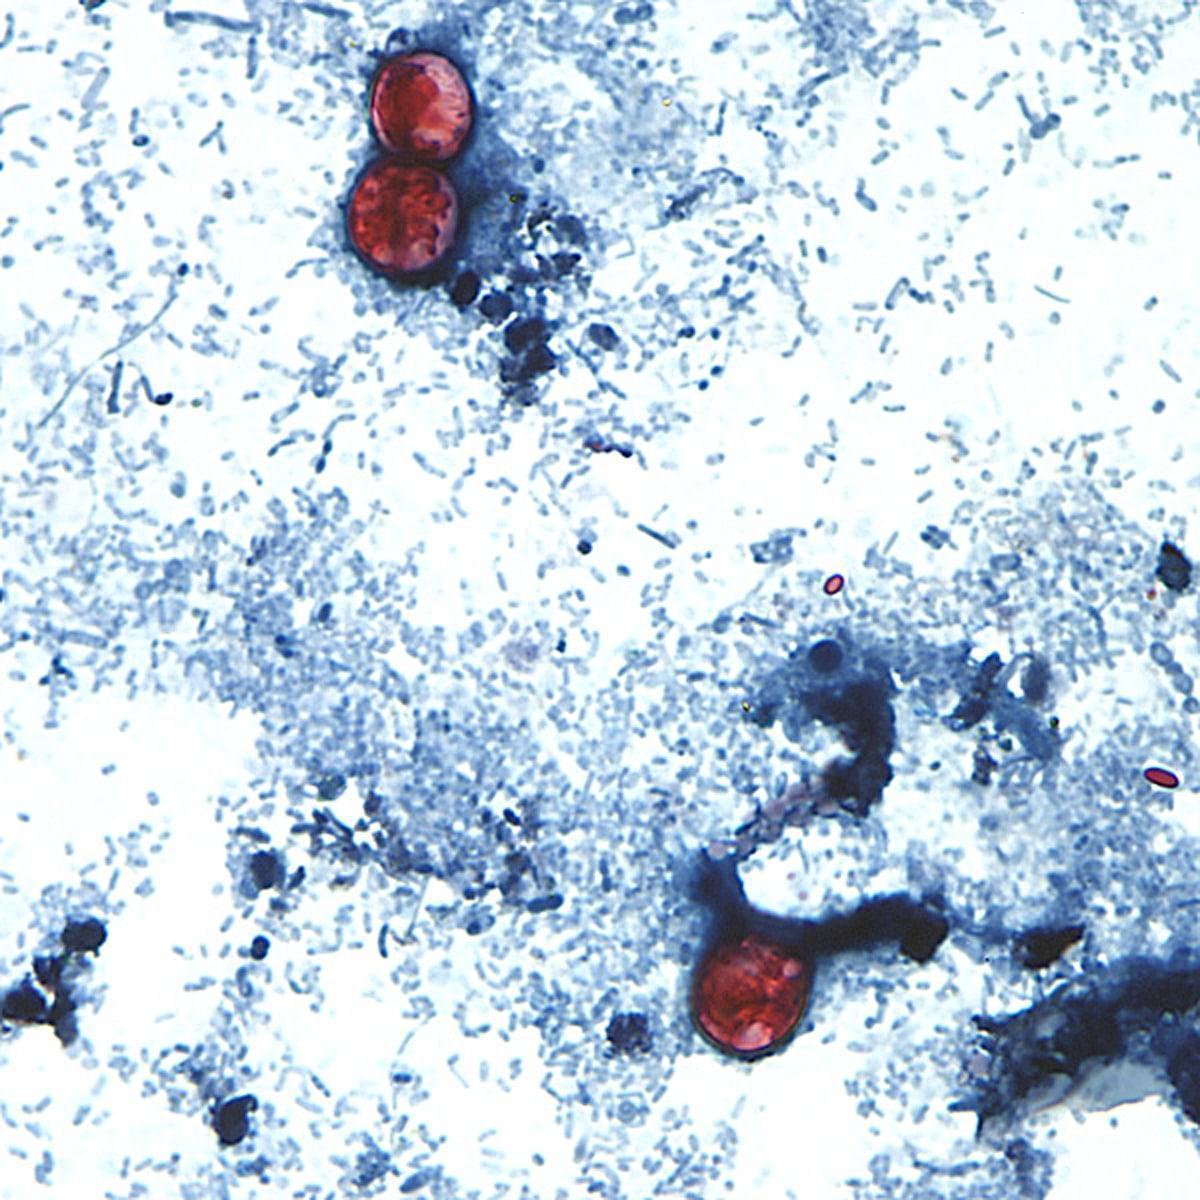 The intestinal parasite cyclospora gets into produce through contact with manure-contaminated water.